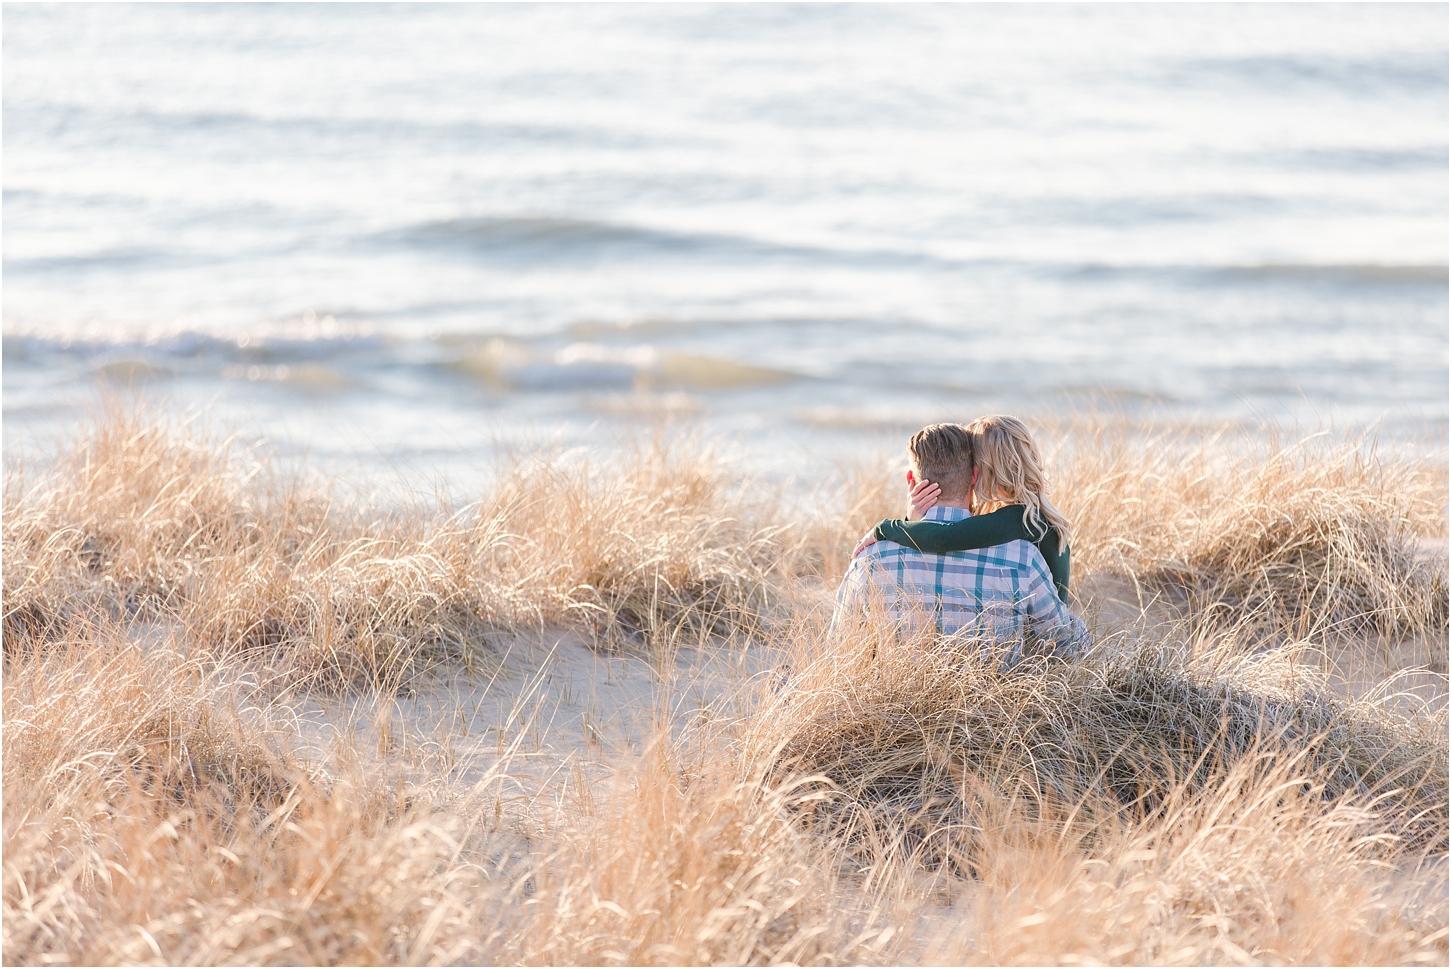 romantic-sunset-beach-engagement-photos-at-silver-beach-in-saint-joseph-mi-by-courtney-carolyn-photography_0008.jpg